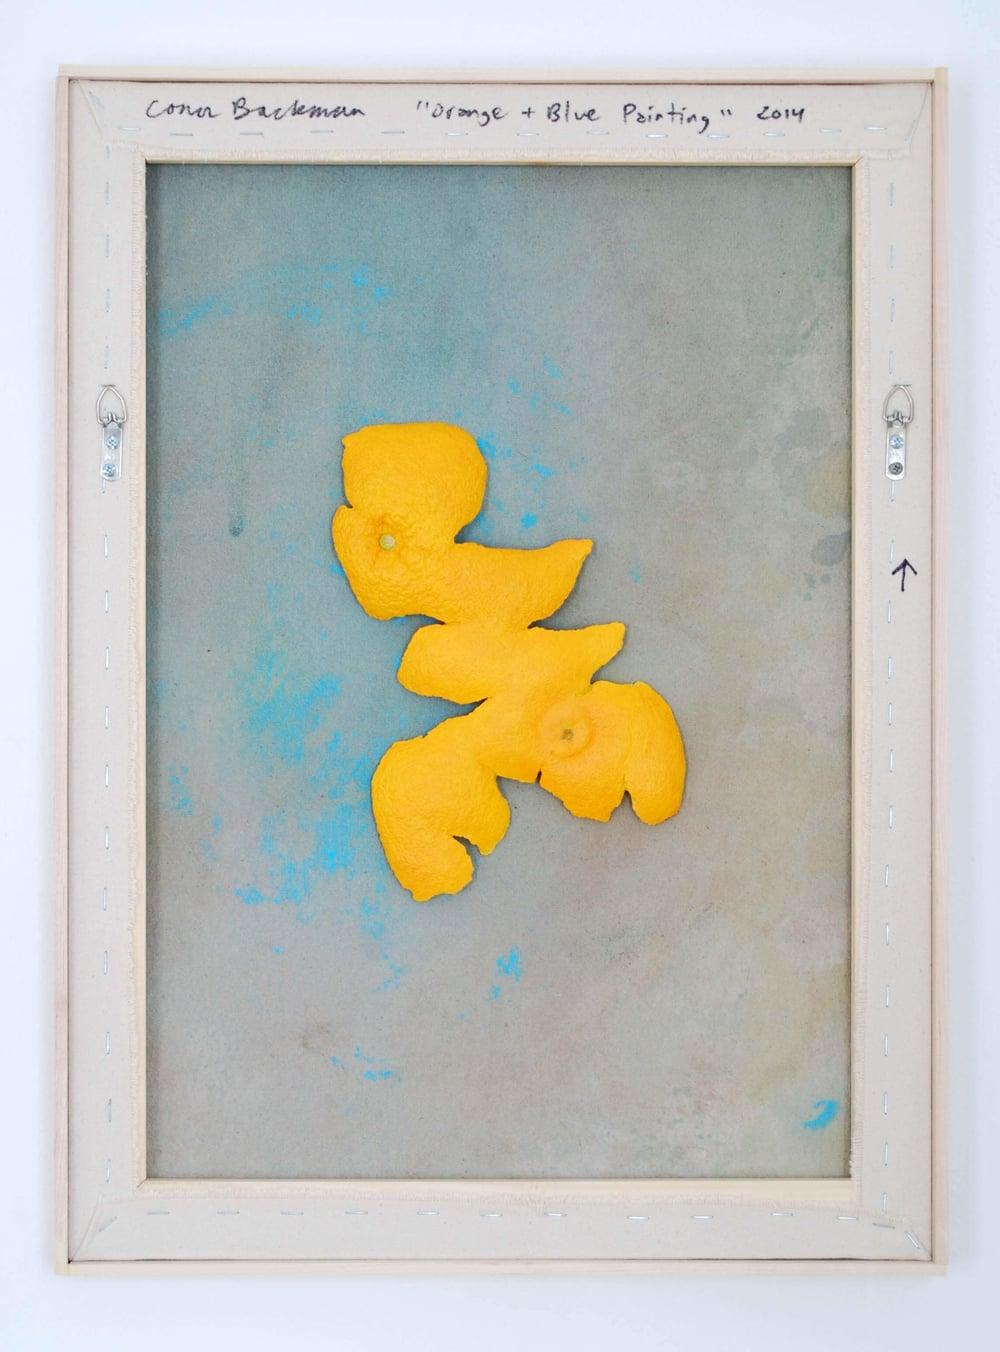 Conor-Backman-Orange-Blue-Painting-2014-Oil-on-canvas-over-panel-cast-aquaresin-acrylic-paint-hardware-artists-frame-61-x-45.5cm-24x18ins-.jpg